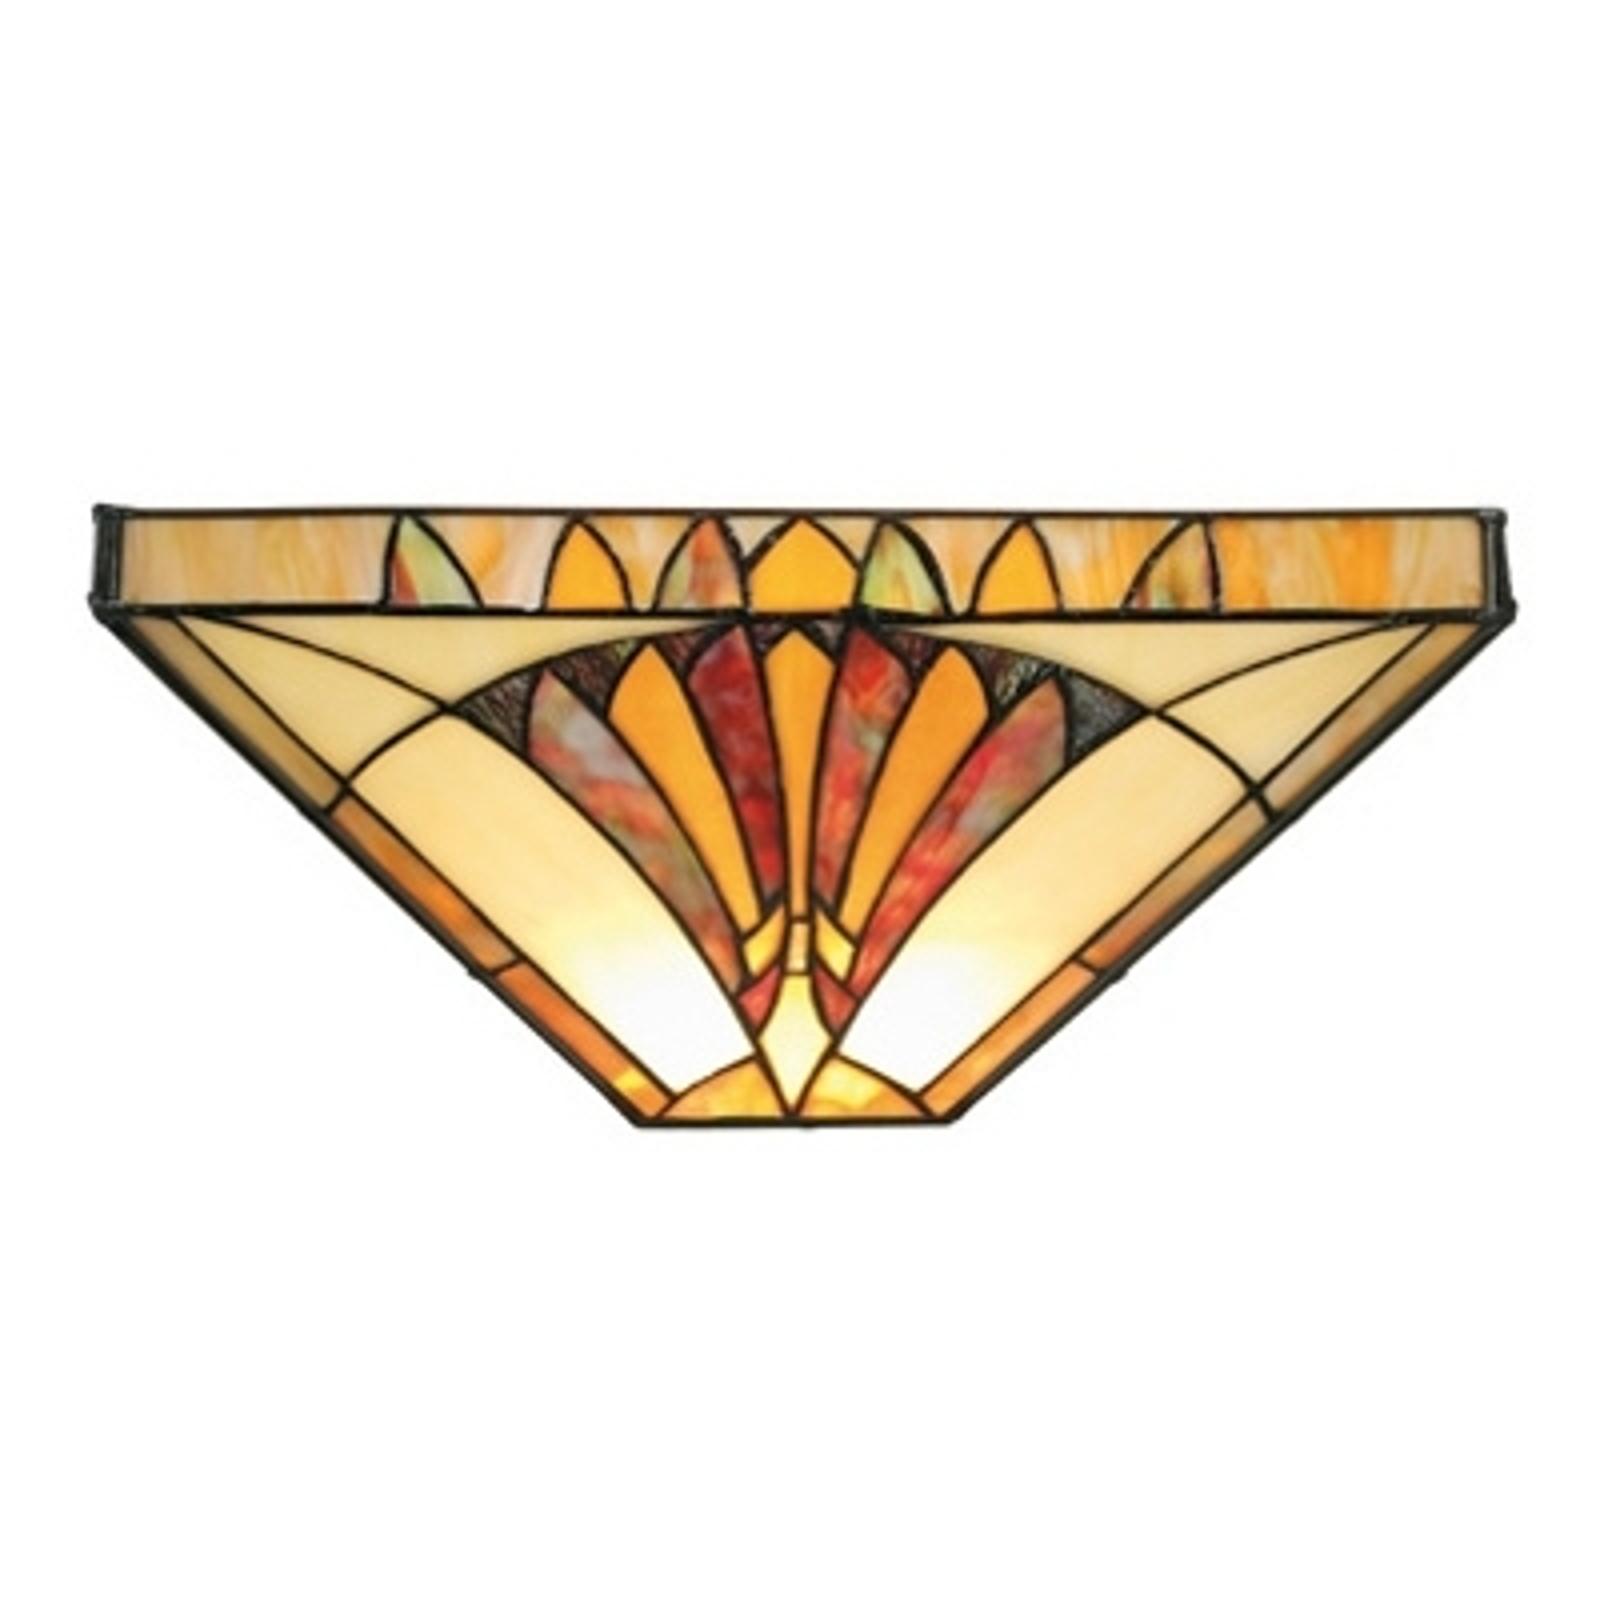 Amalia – štýl Tiffany nástenné svietidlo_1032032_1